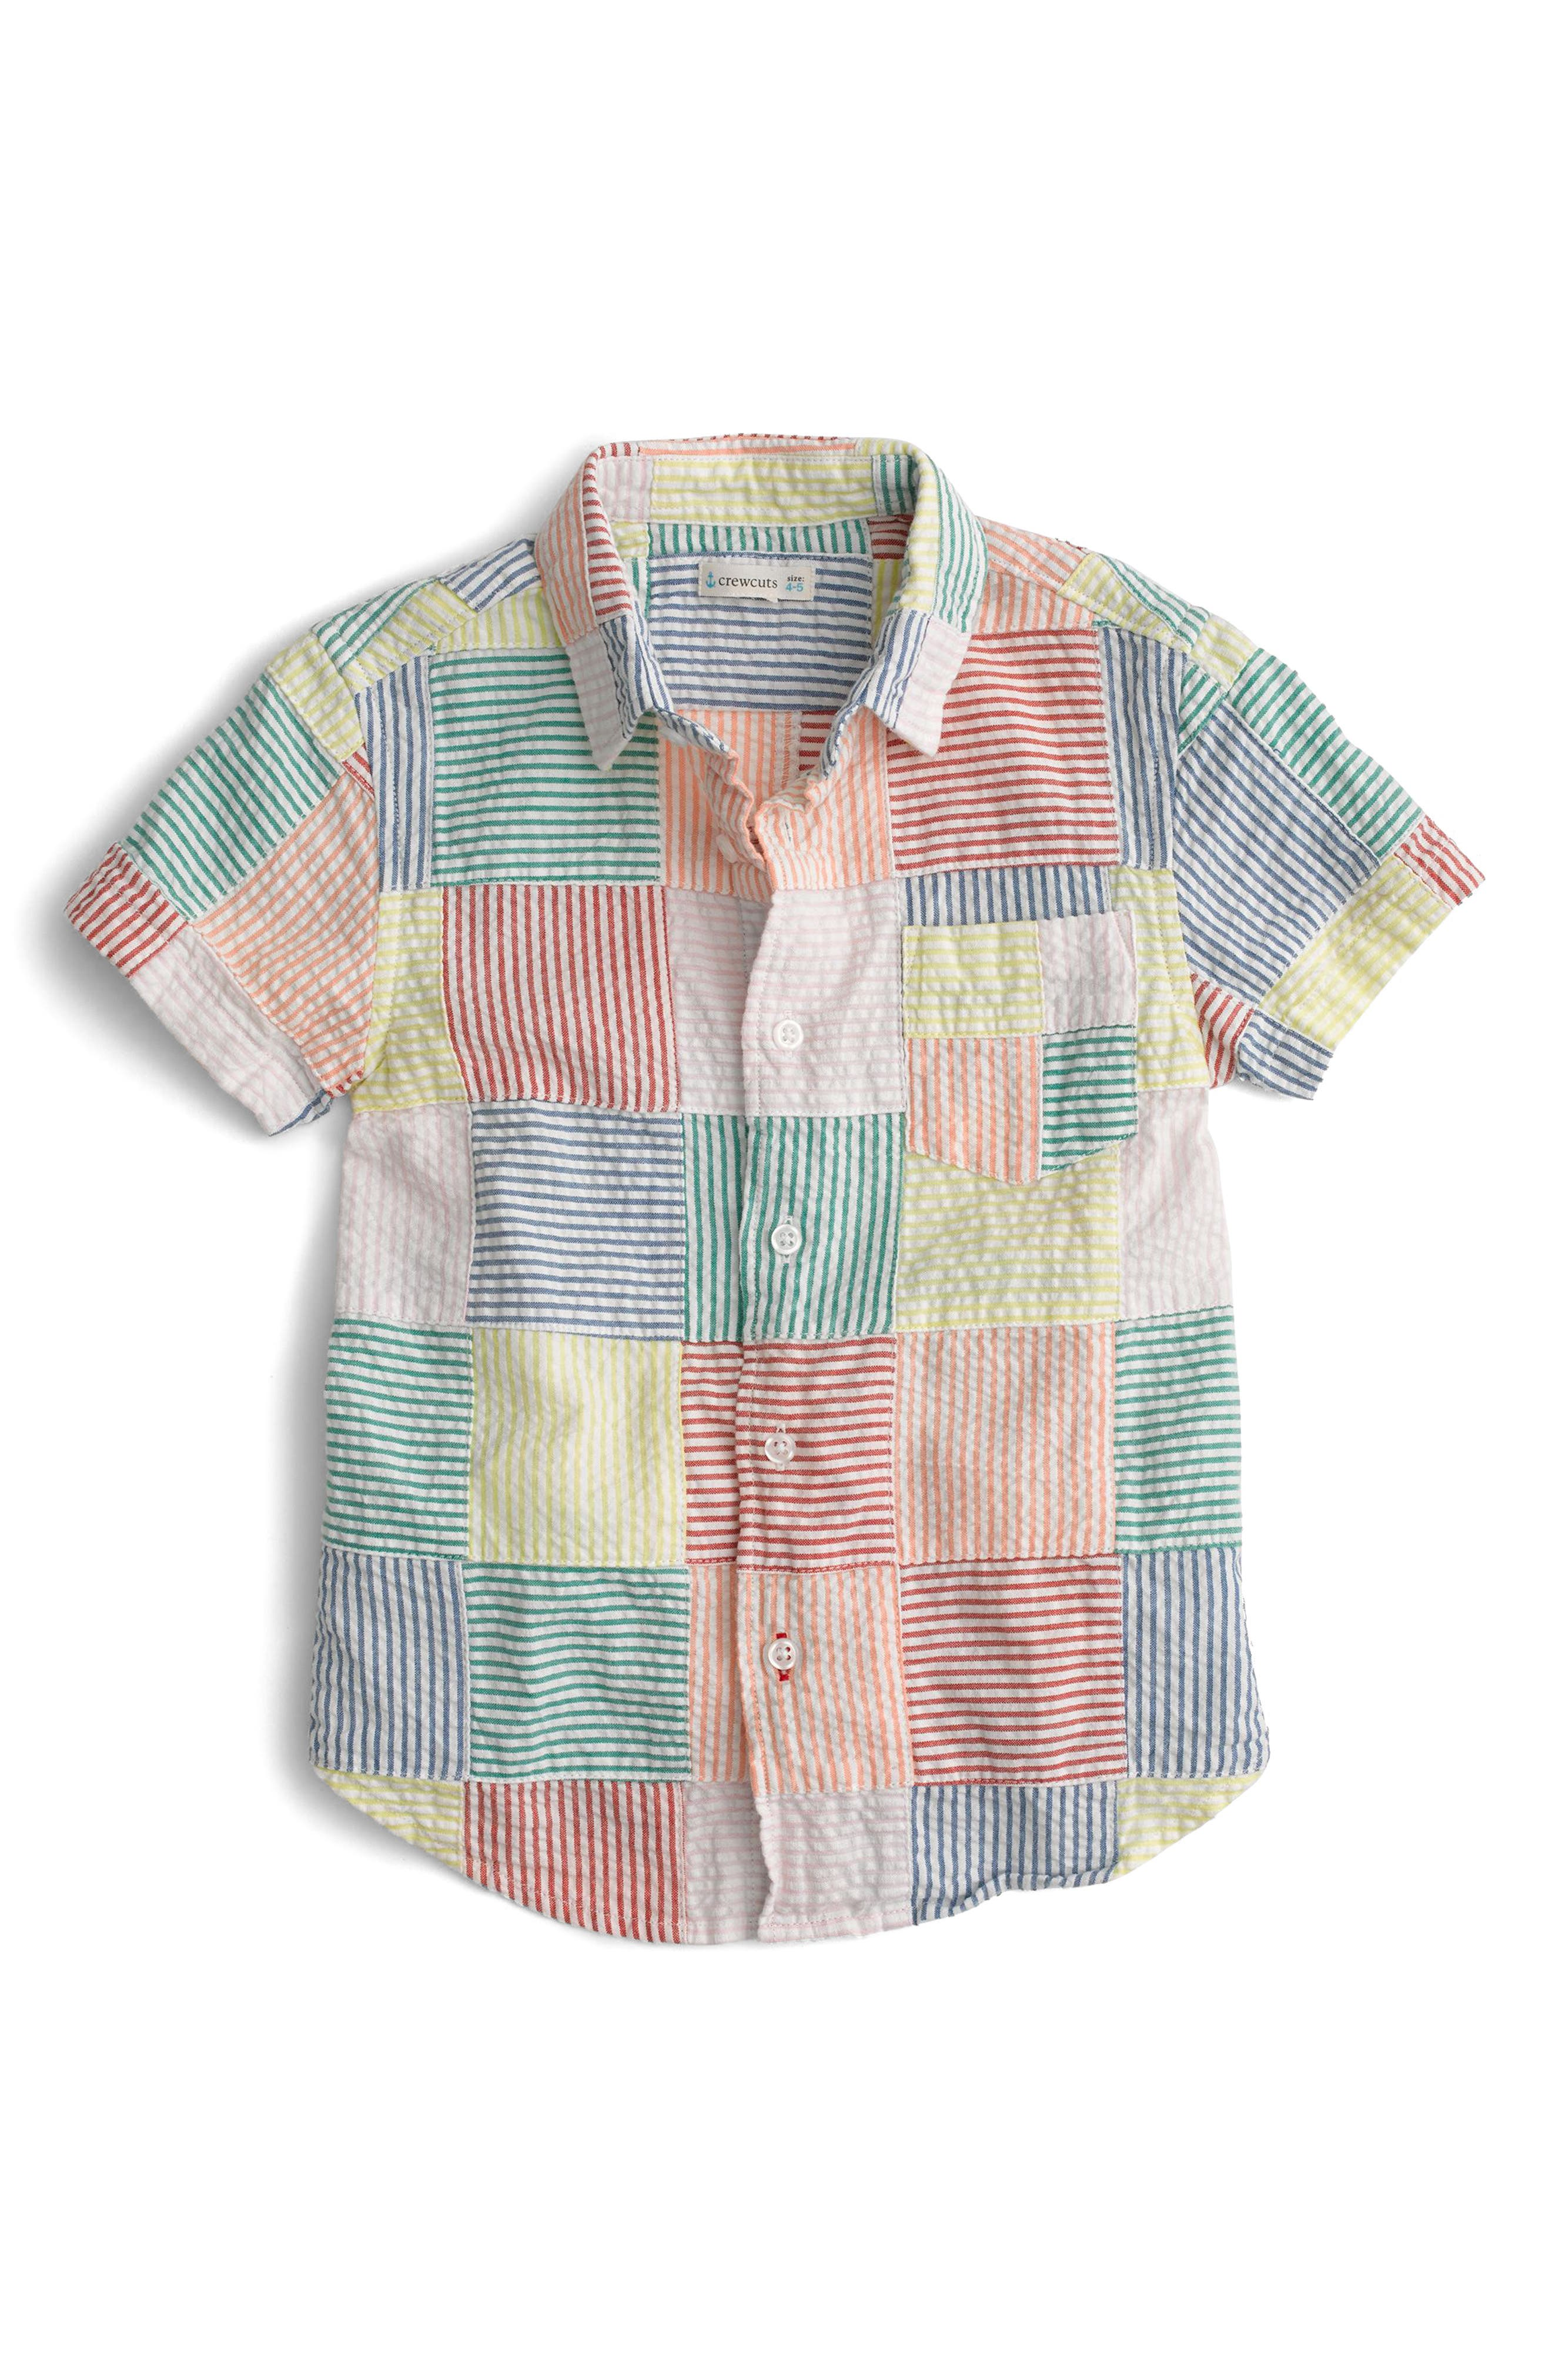 Patchwork Woven Shirt,                             Main thumbnail 1, color,                             900